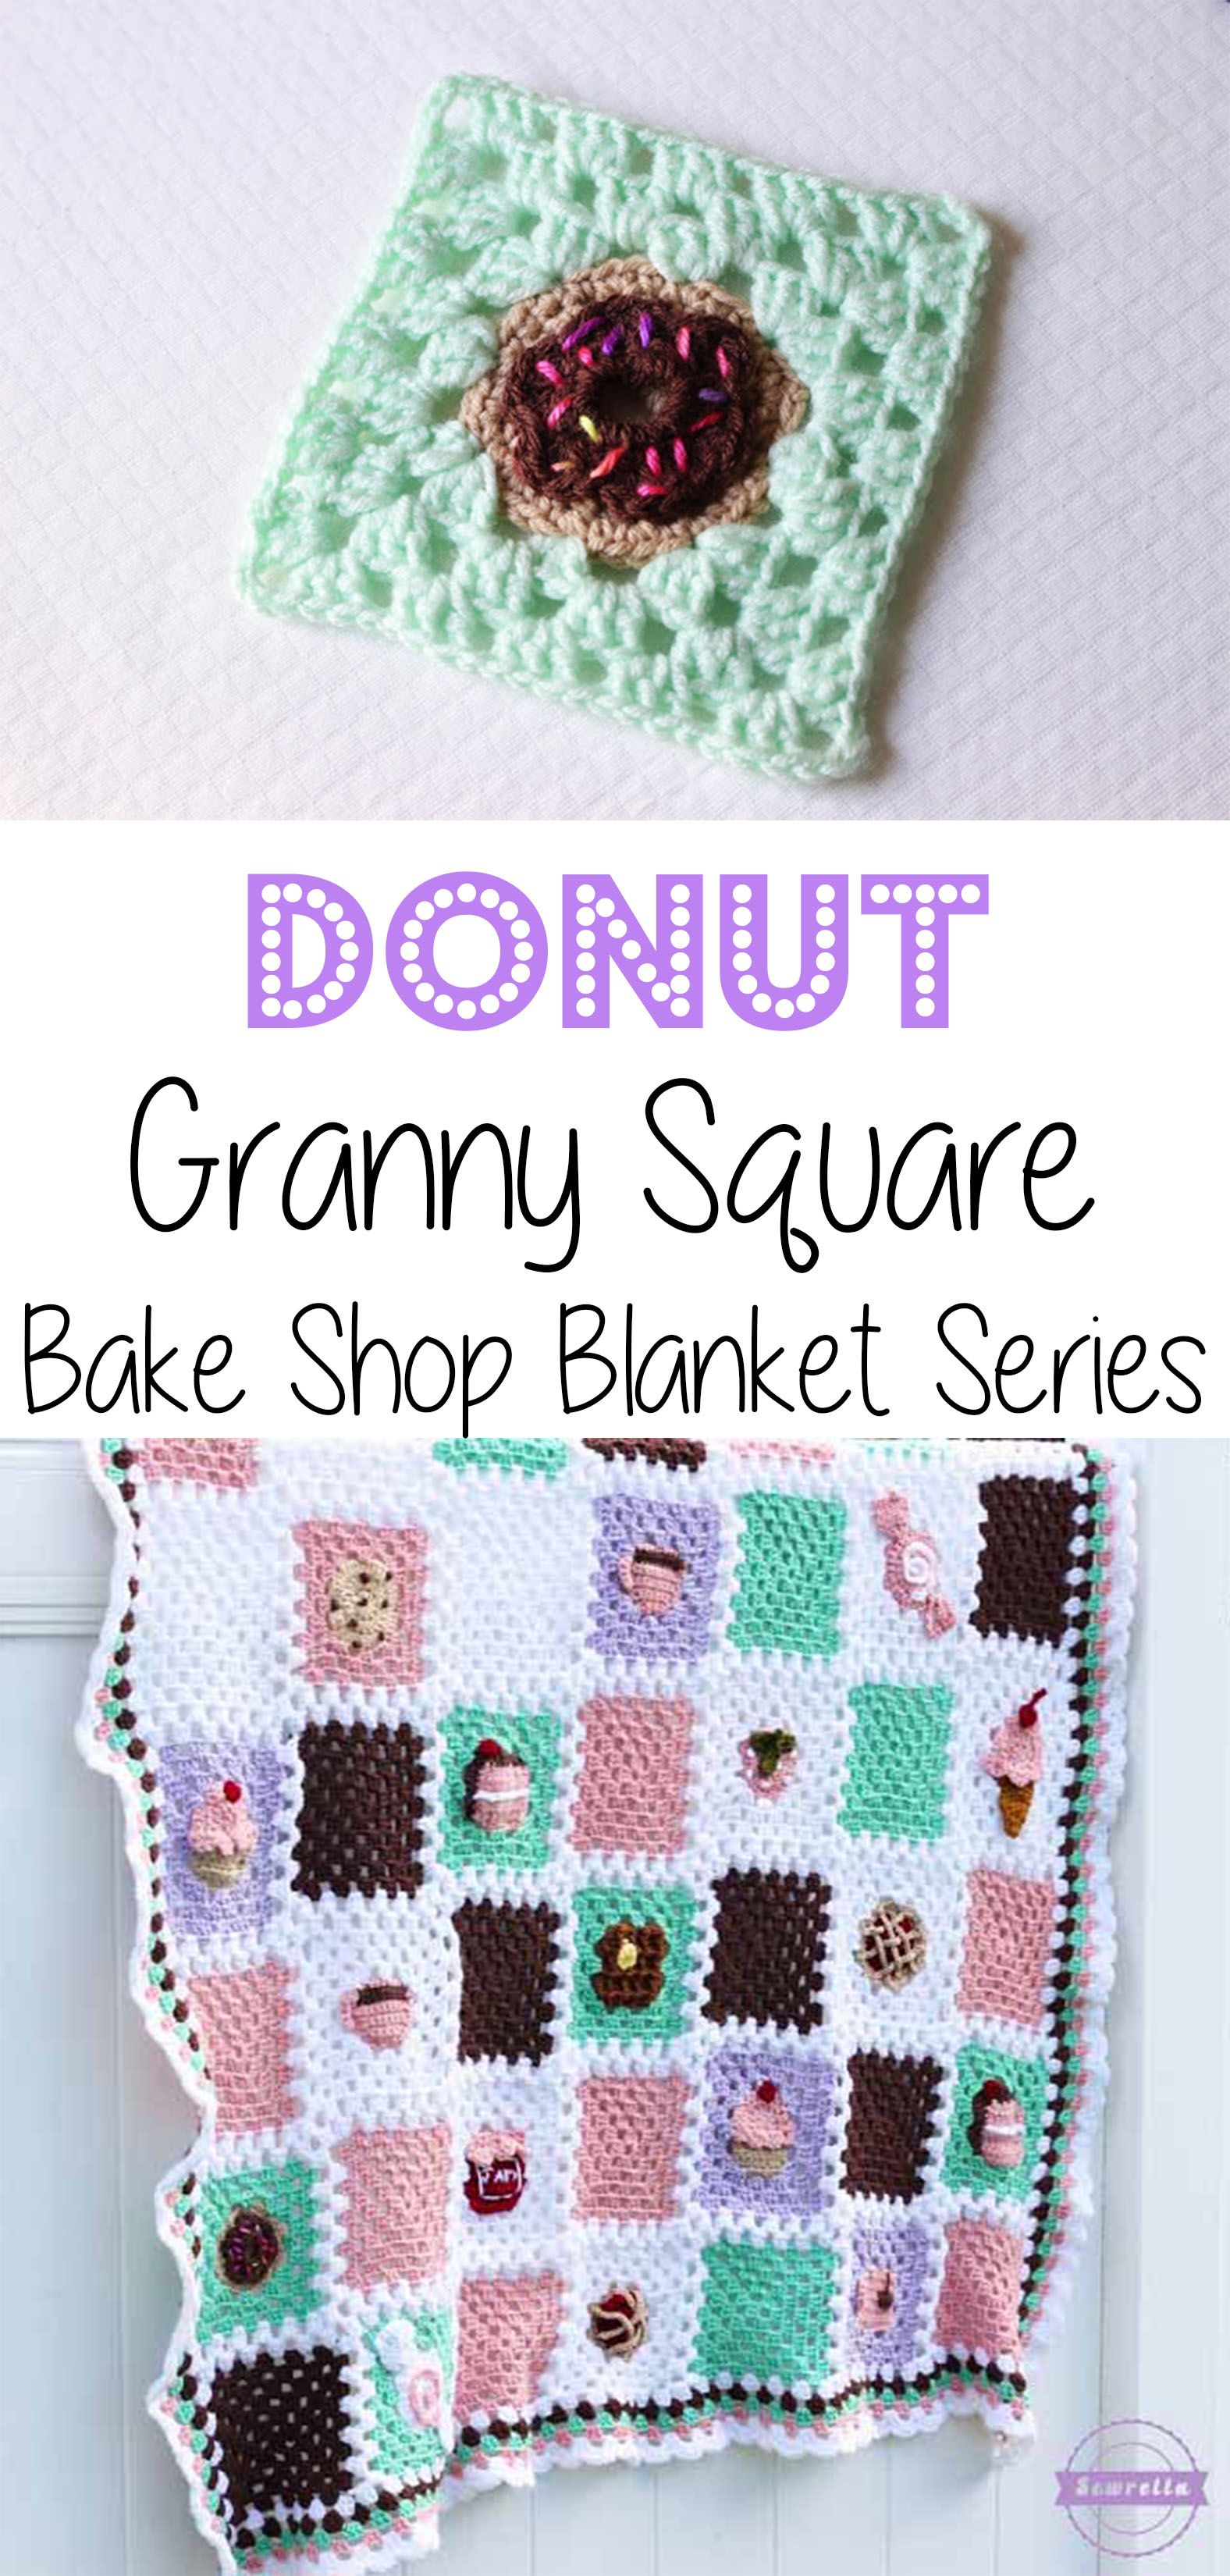 Crochet donut granny square bake shop blanket series granny crochet donut granny square bake shop blanket series bankloansurffo Image collections